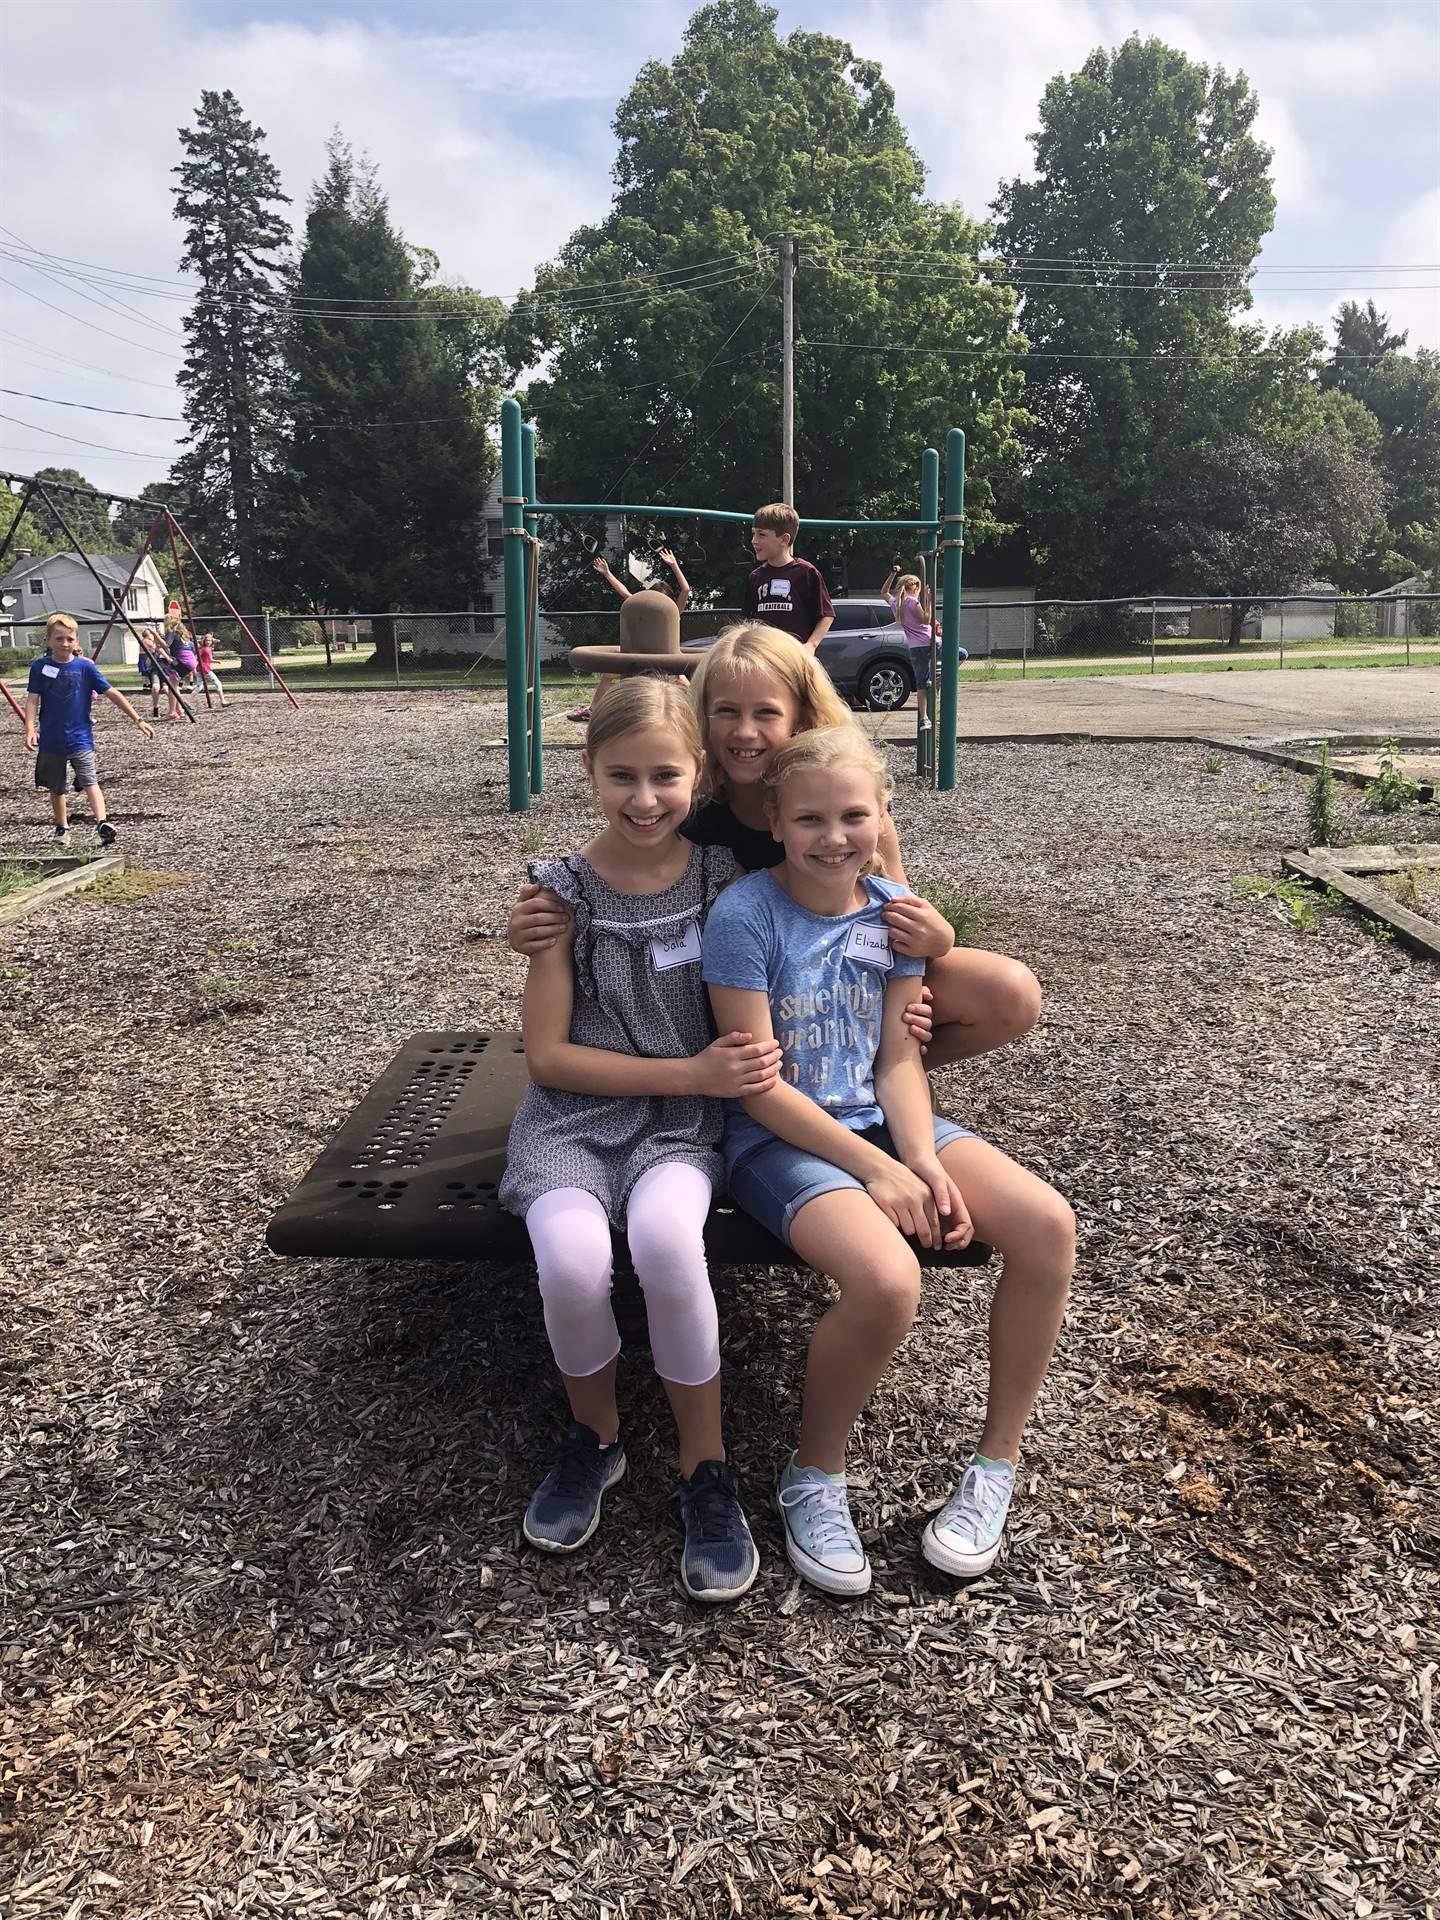 Students enjoying recess.